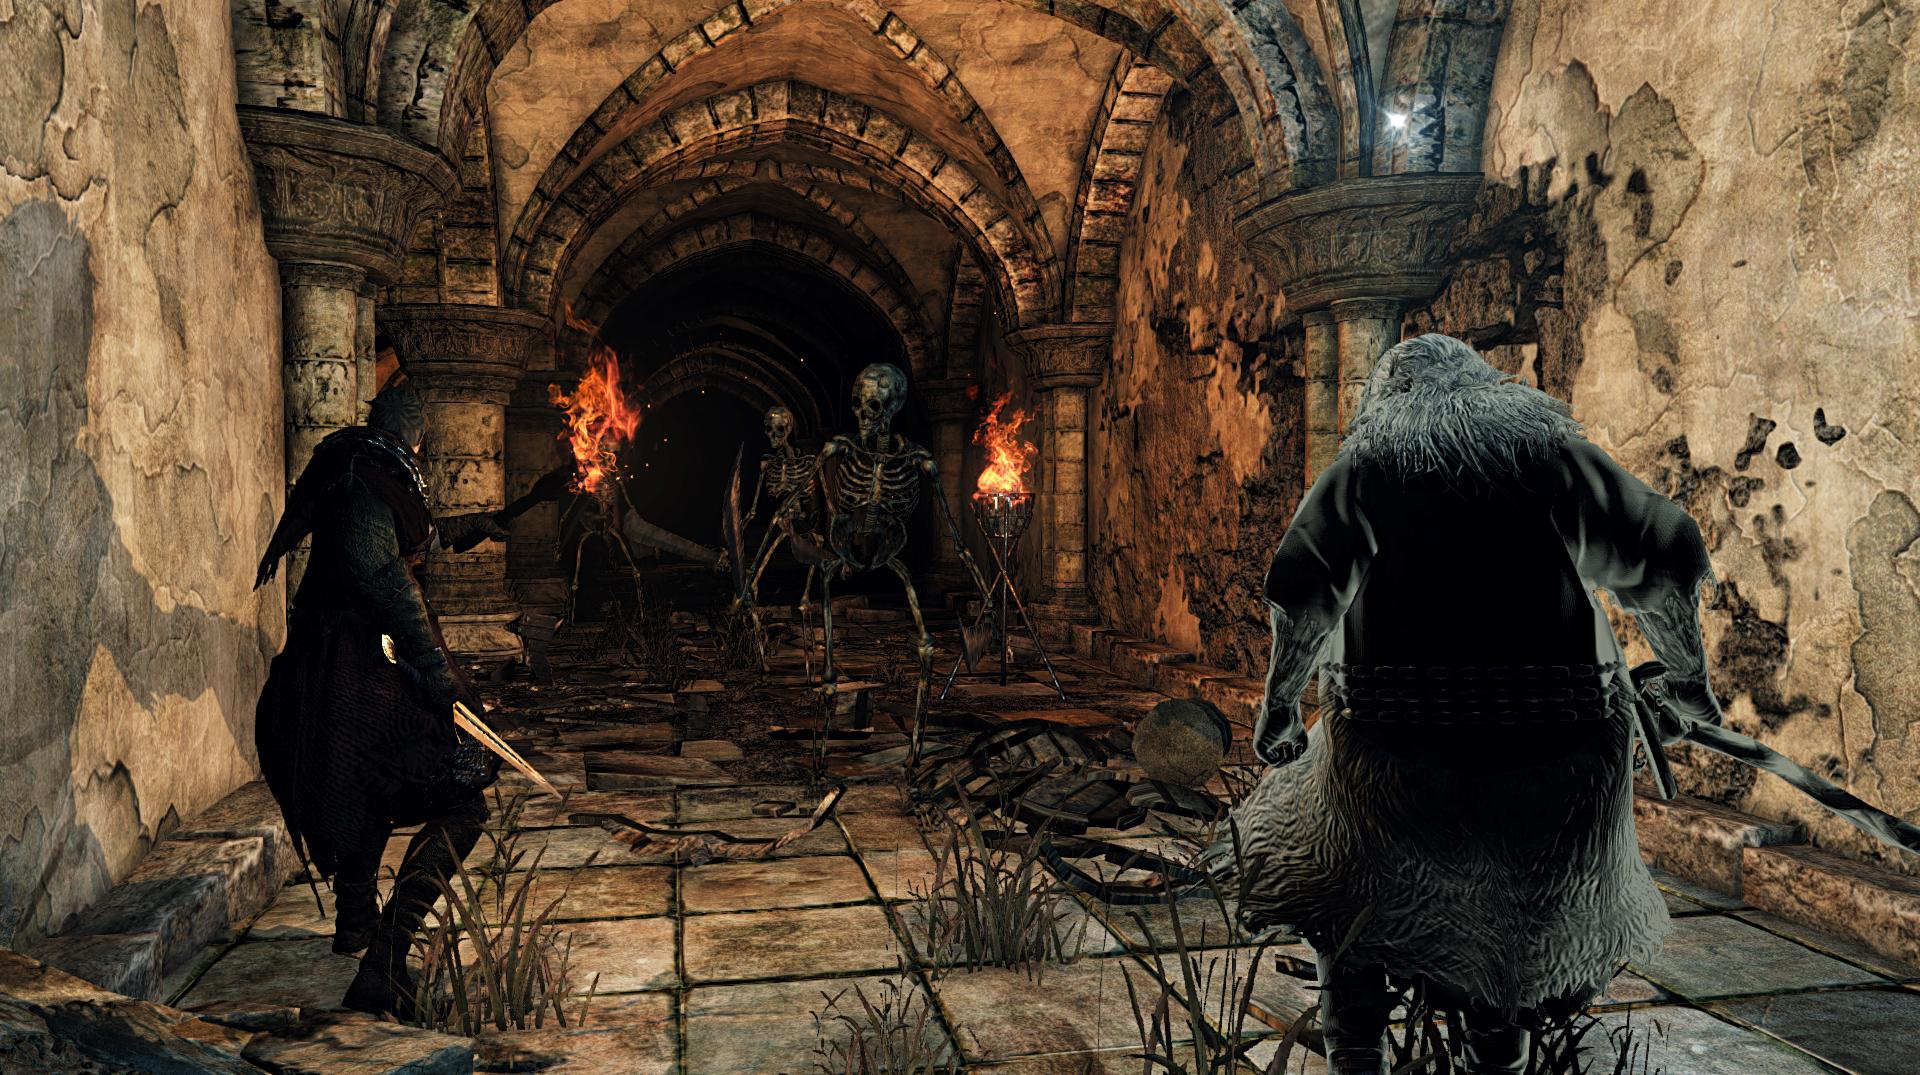 Obrazem: Temné dungeony, kostlivci a monstra z Dark Souls 2: Scholar of the First Sin 107553